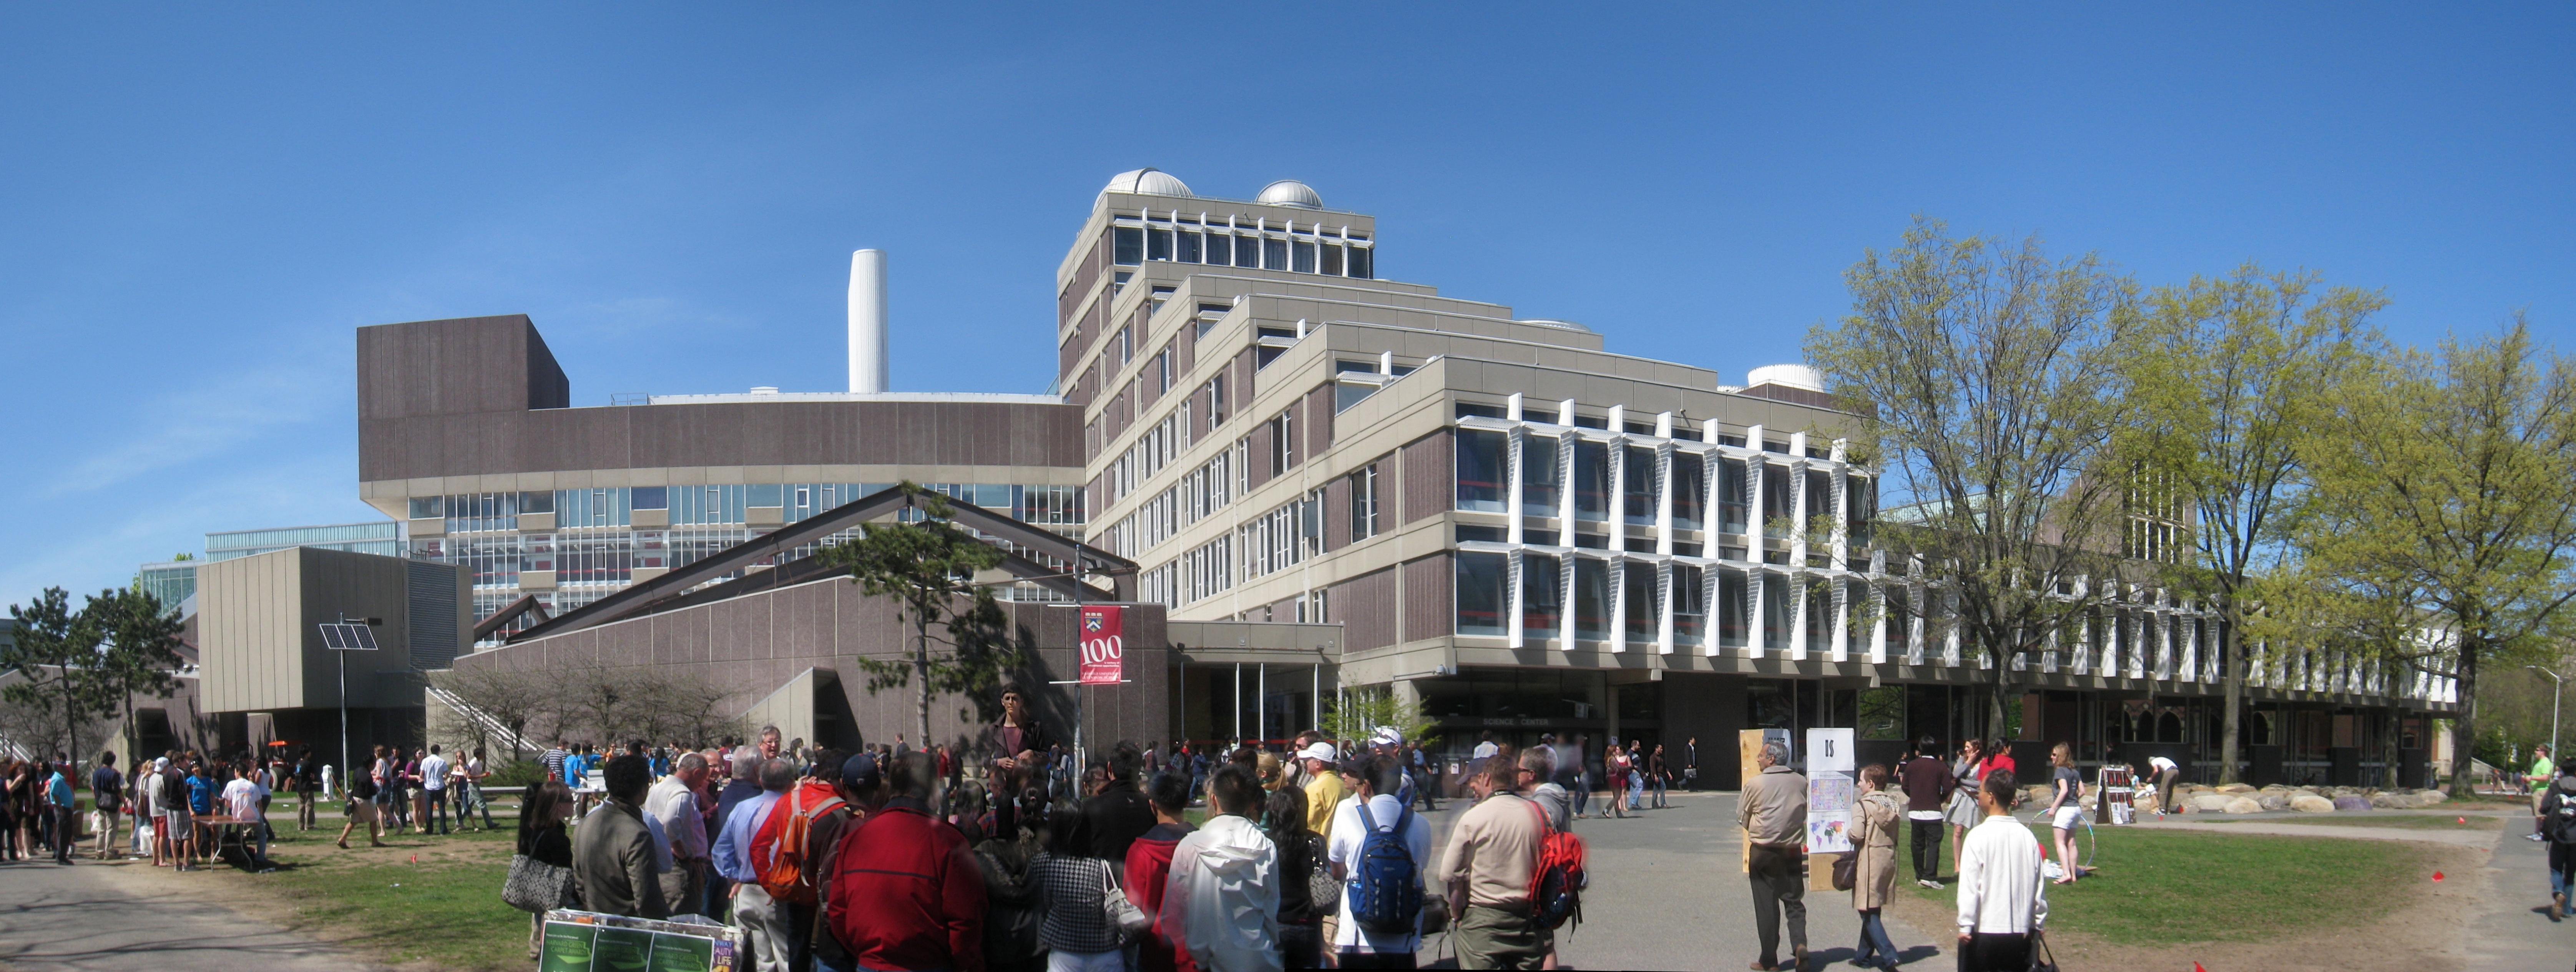 Harvard University Harvard Design School Urban Planning